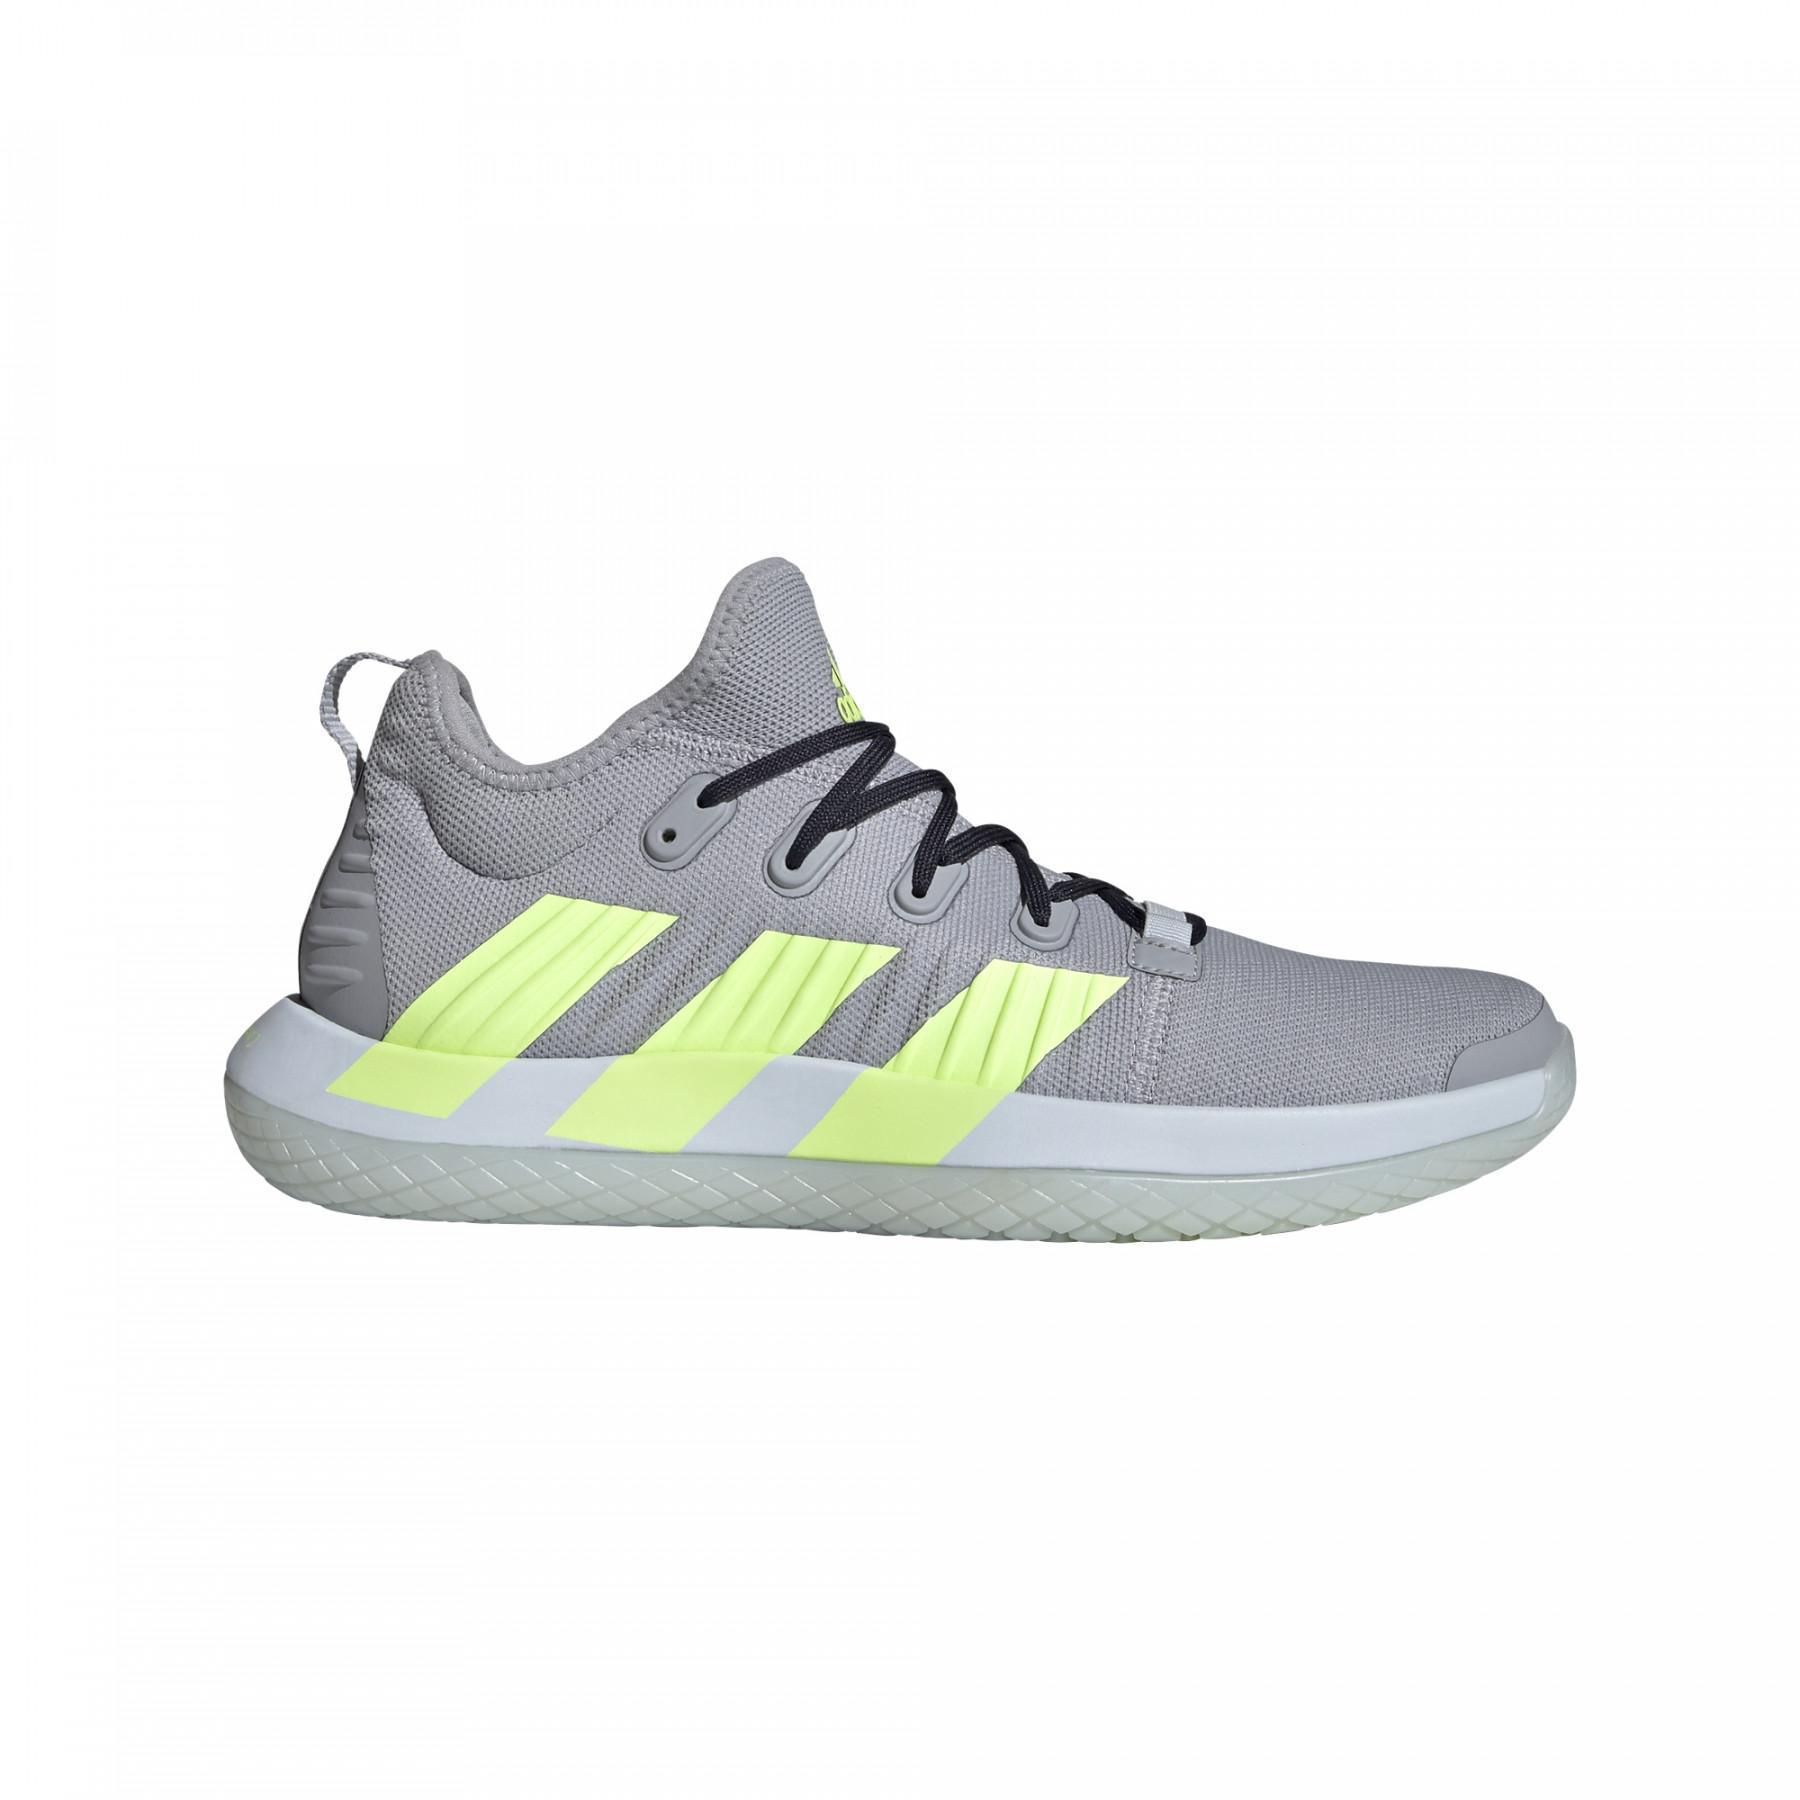 Shoes adidas Stabil Next Gen Pri